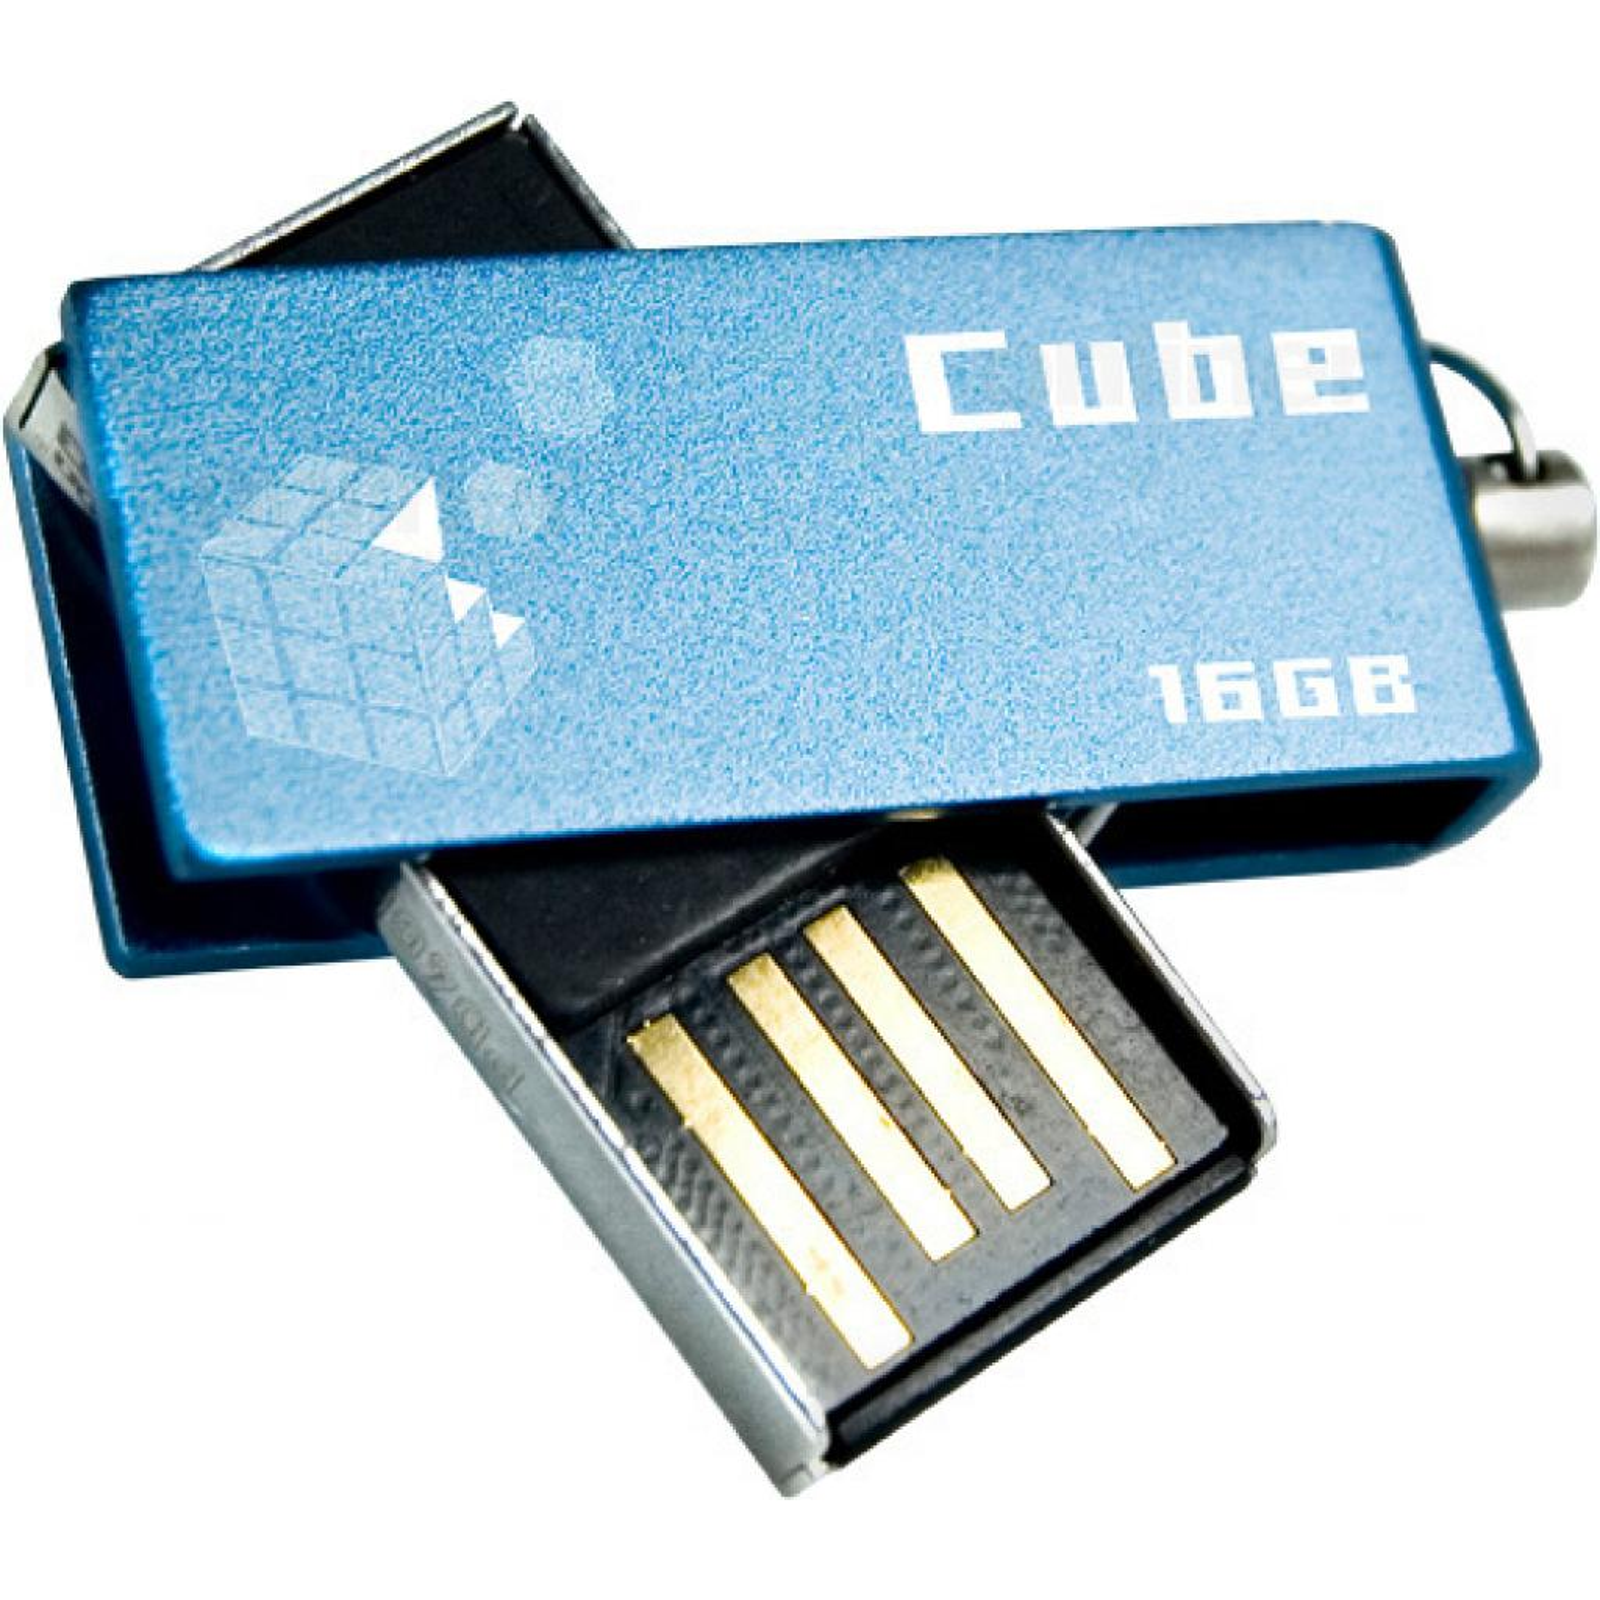 USB флеш накопитель GOODRAM 16Gb Cube Blue (PD16GH2GRCUBR9) изображение 2